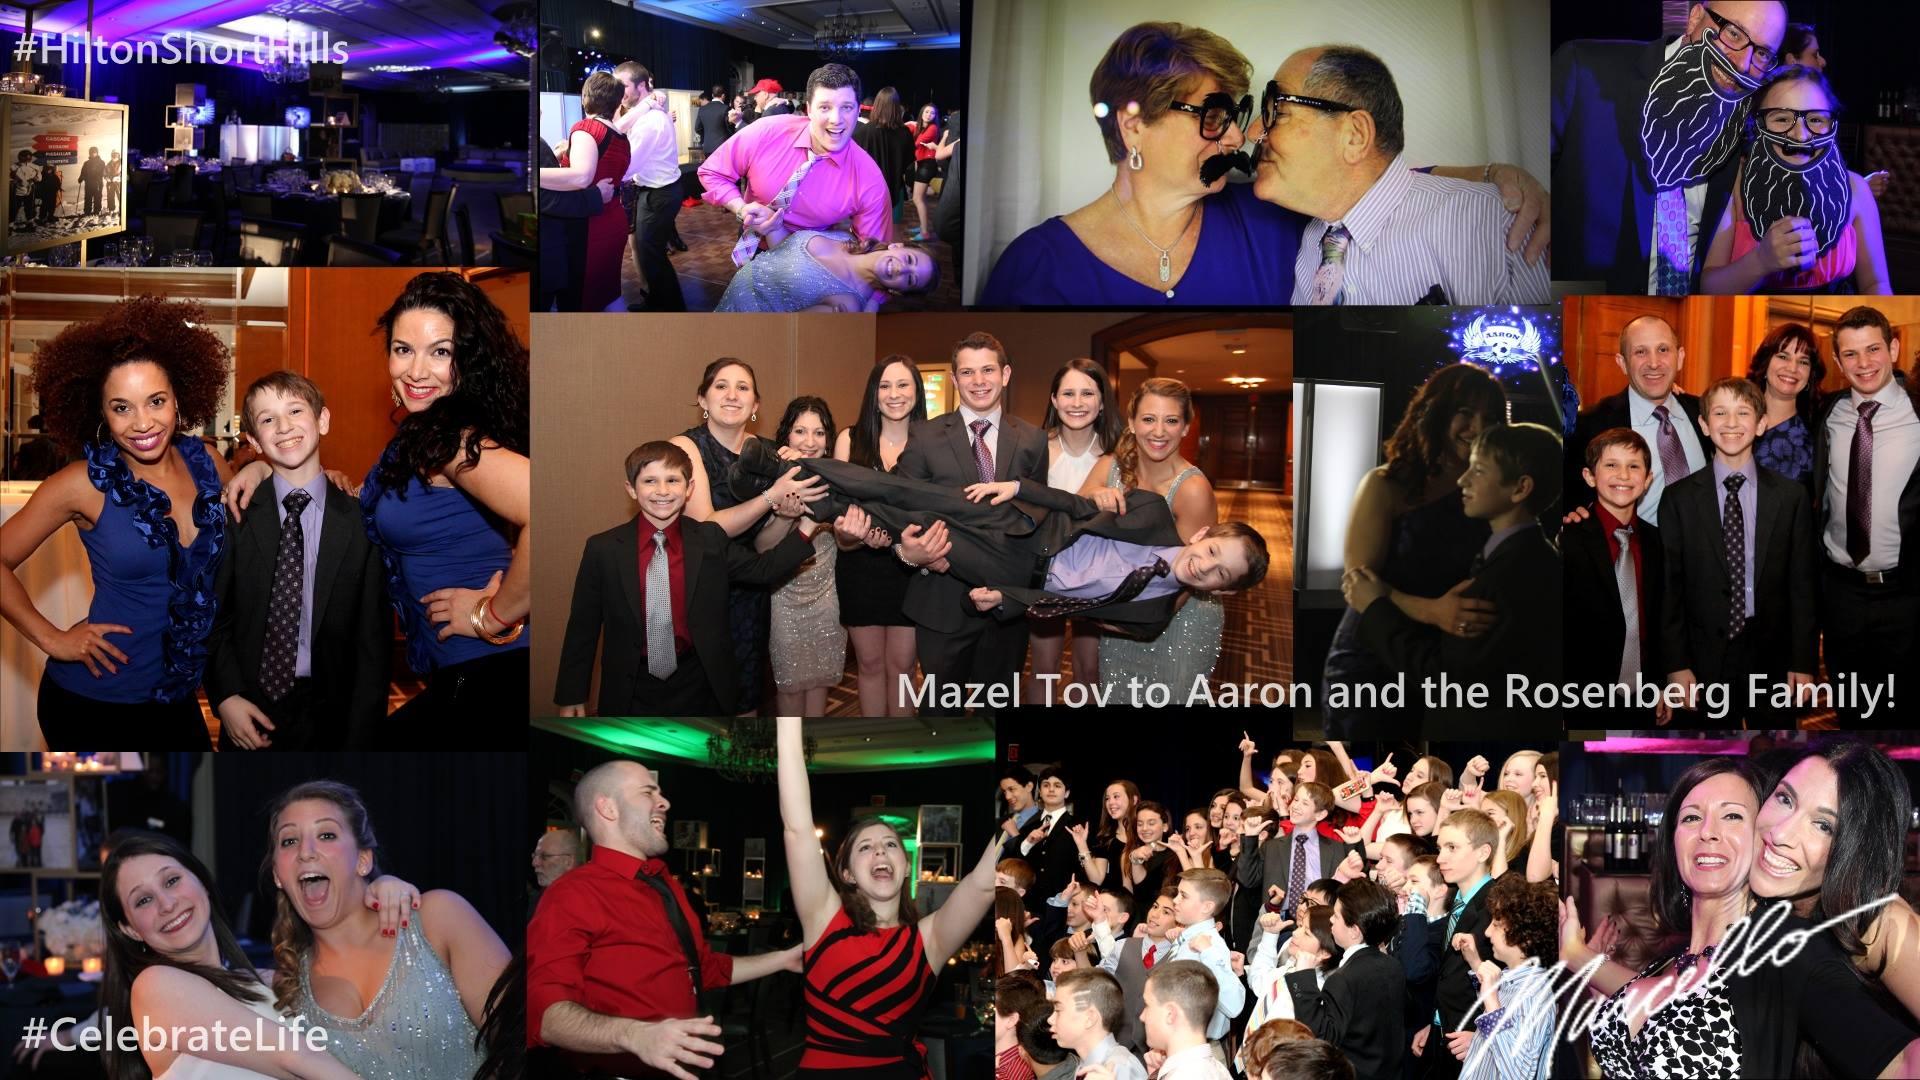 MMP Entertainment, Short Hills Hilton, NJ Bat Mitzvah, NJ Bar Mitzvah, Marcello Pedalino